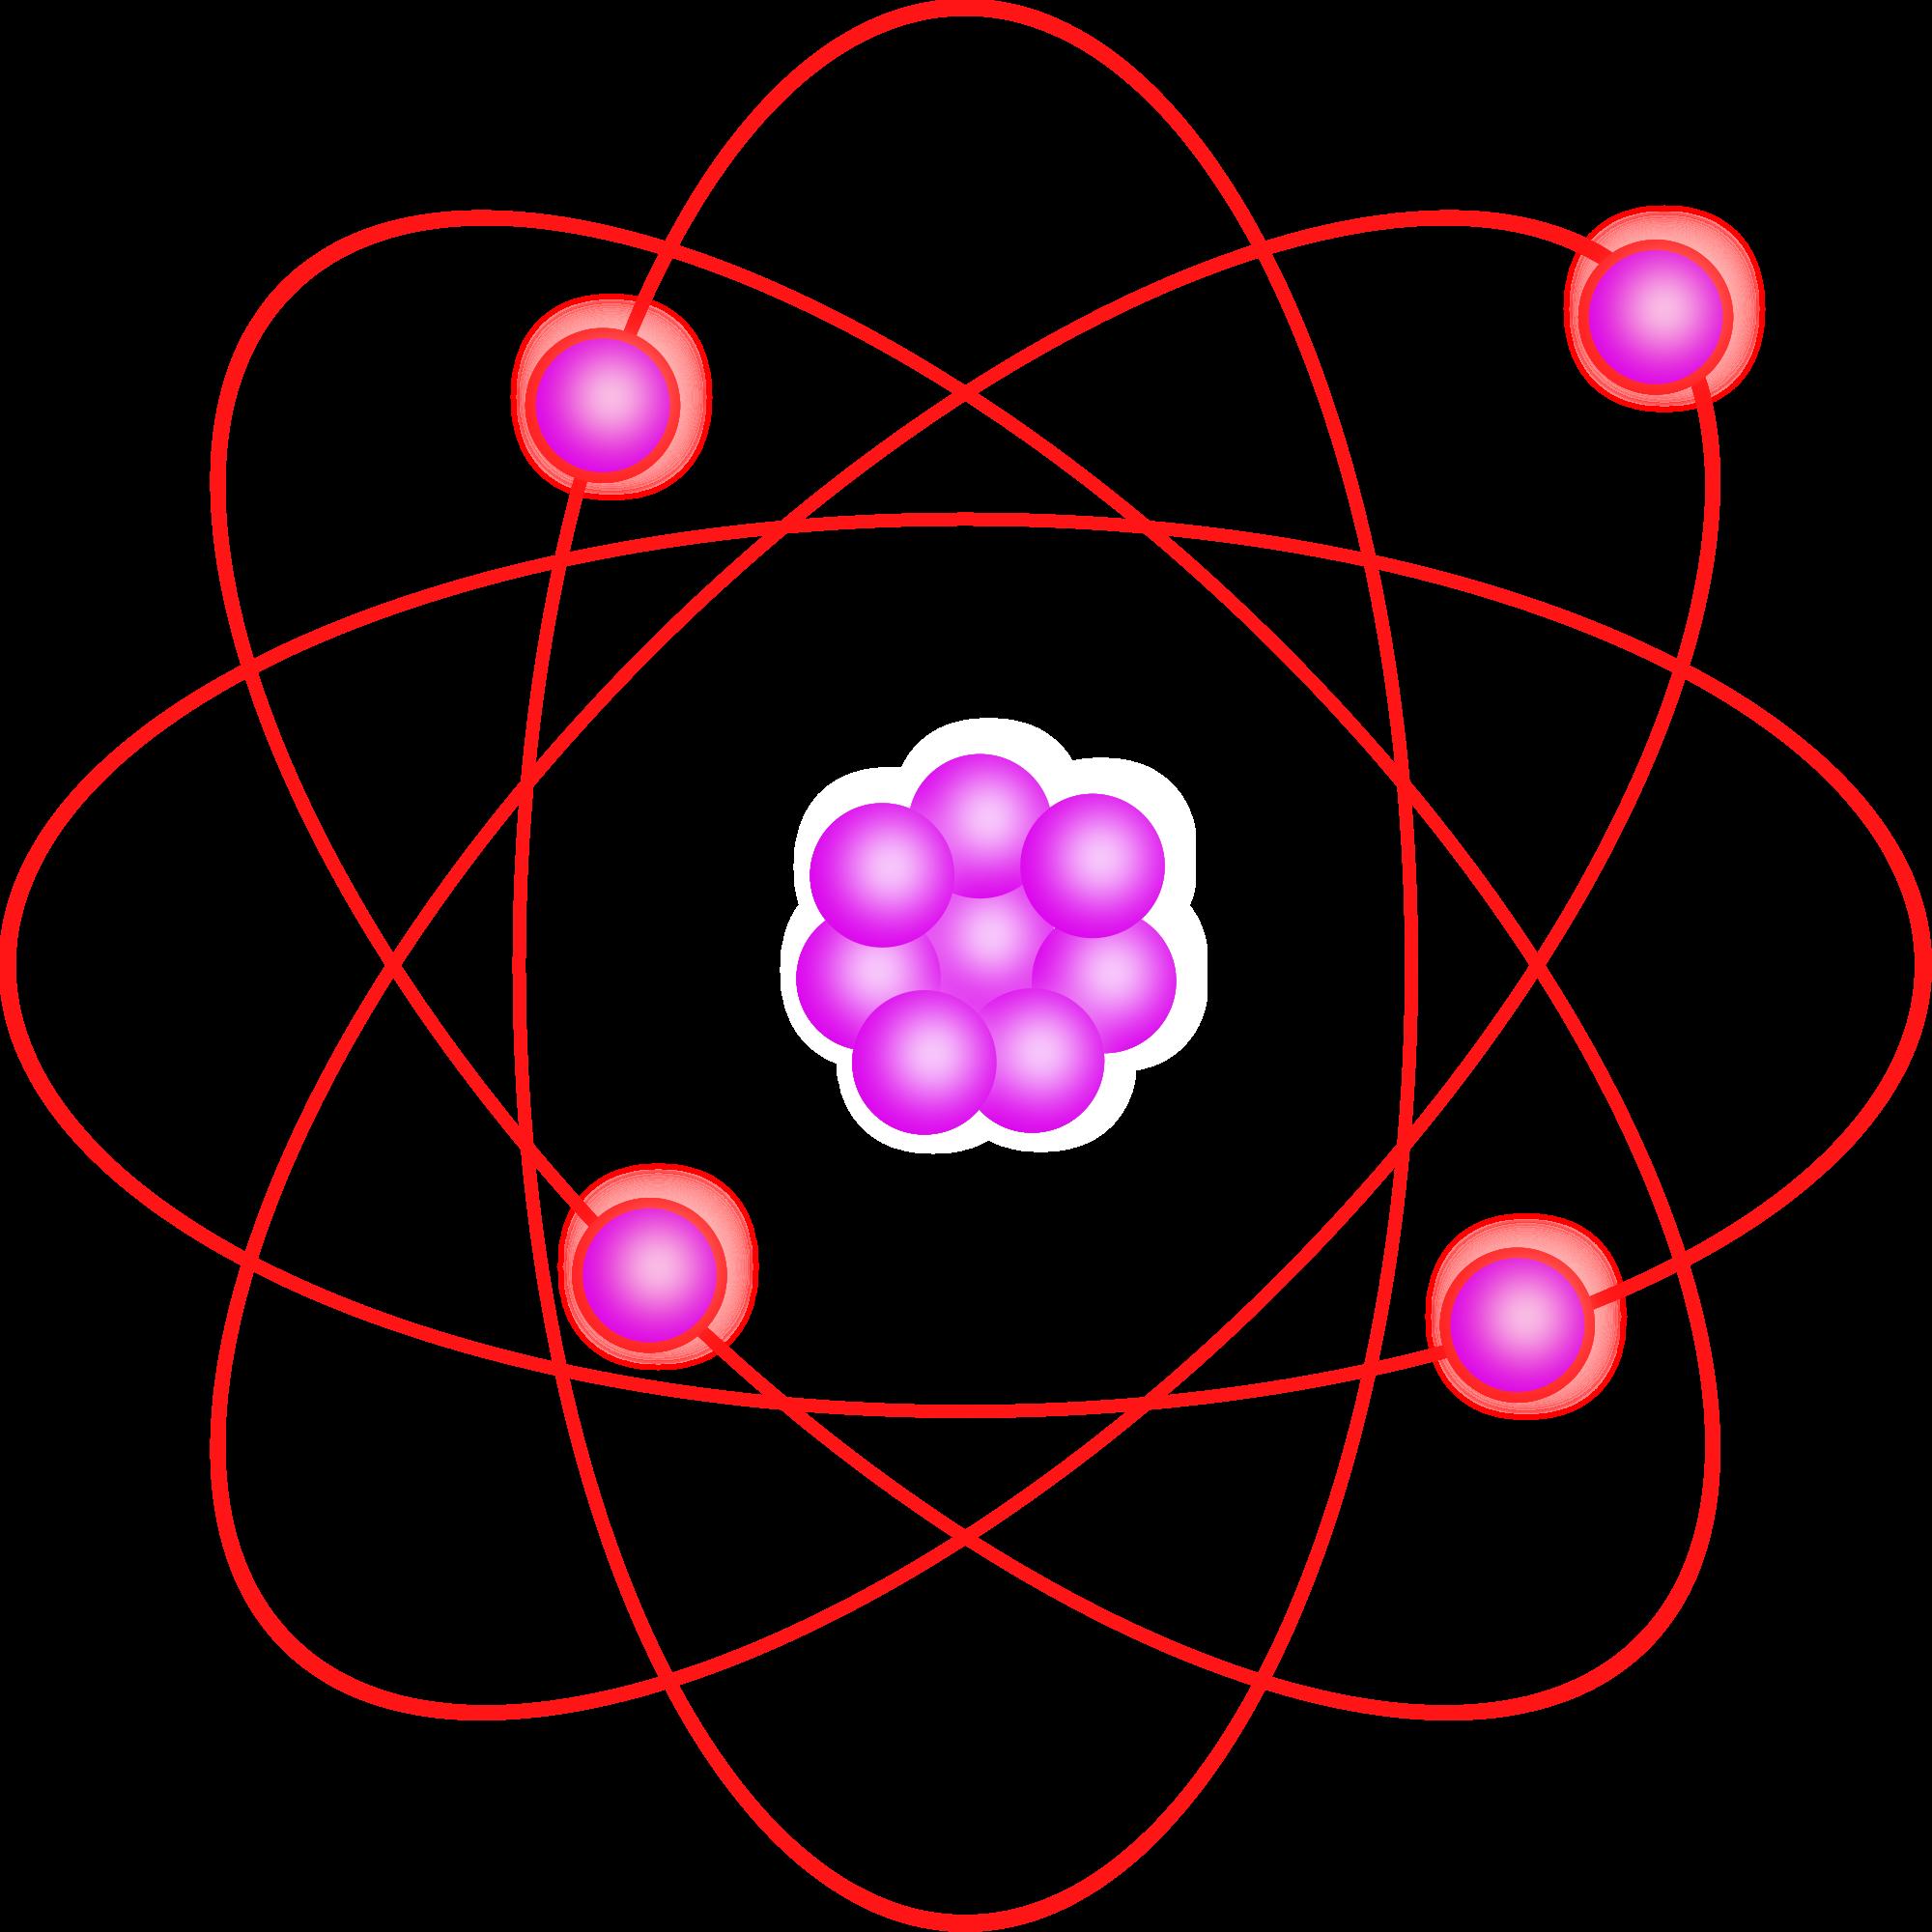 Atom clipart neutron. File violet svg wikimedia